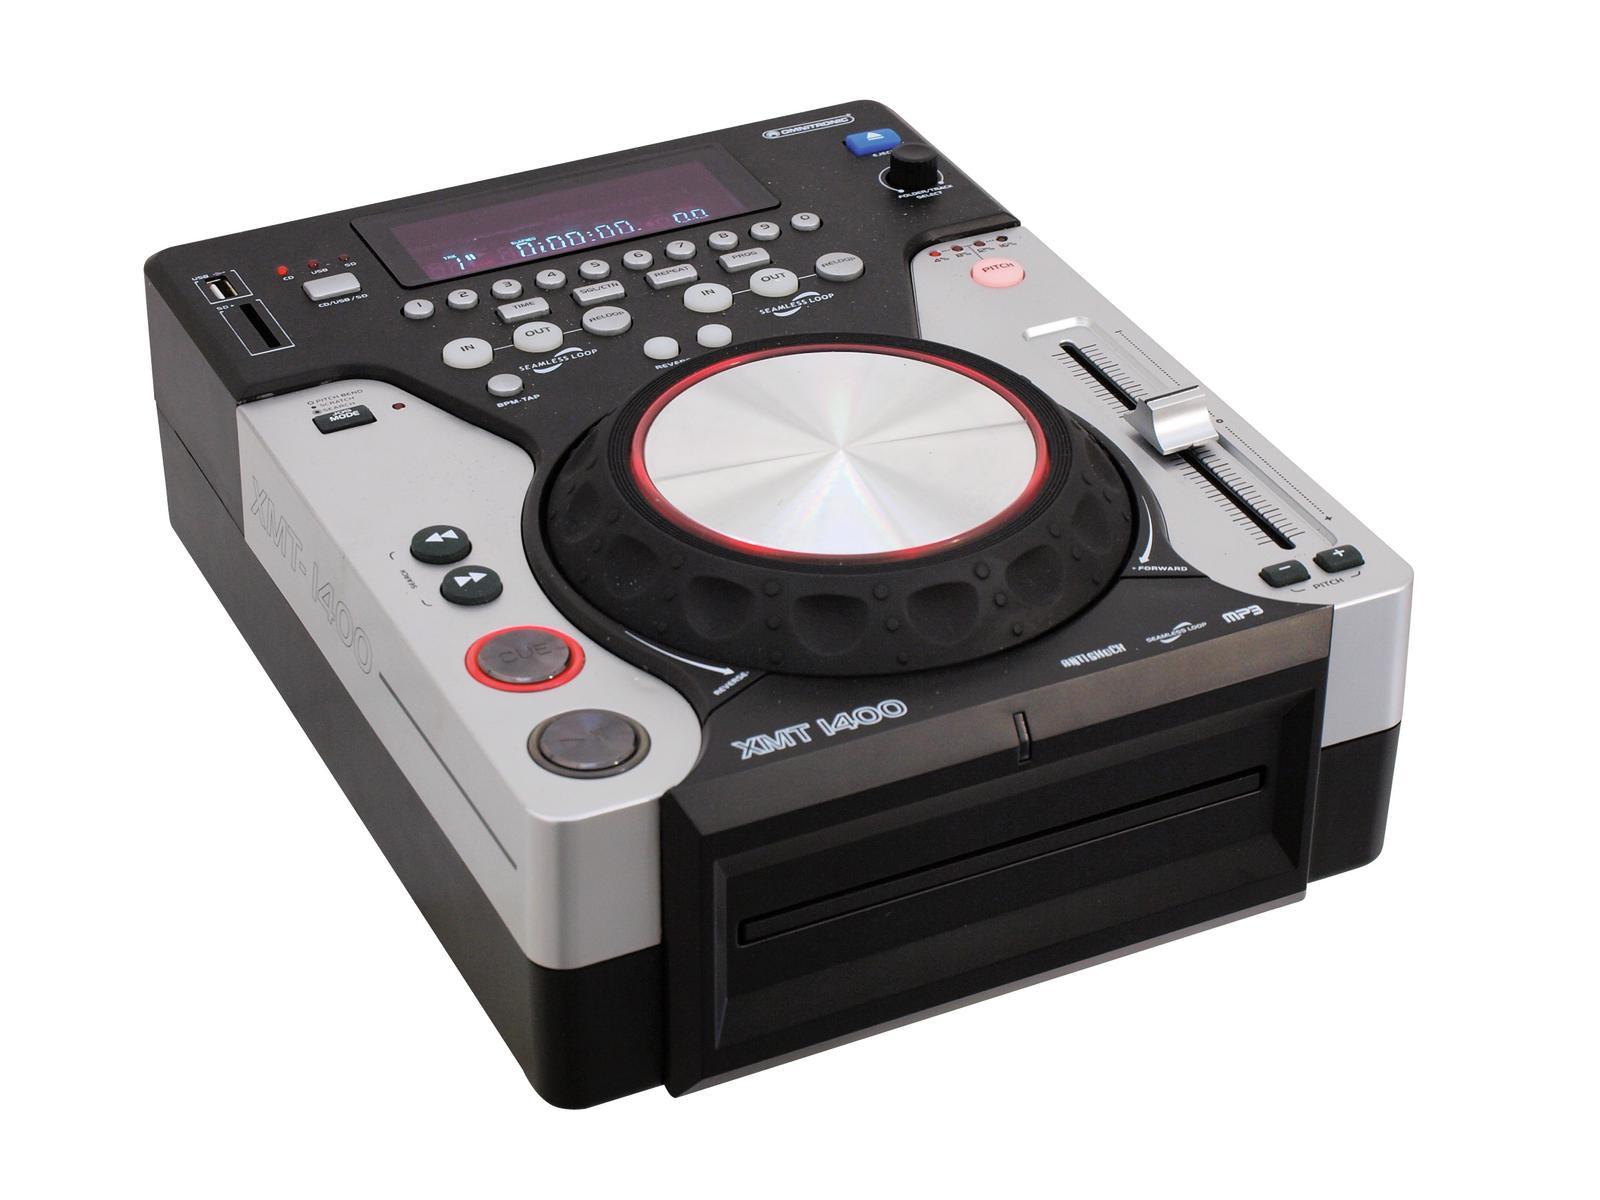 omnitronic-xmt-1400-mp3-usb-scratch